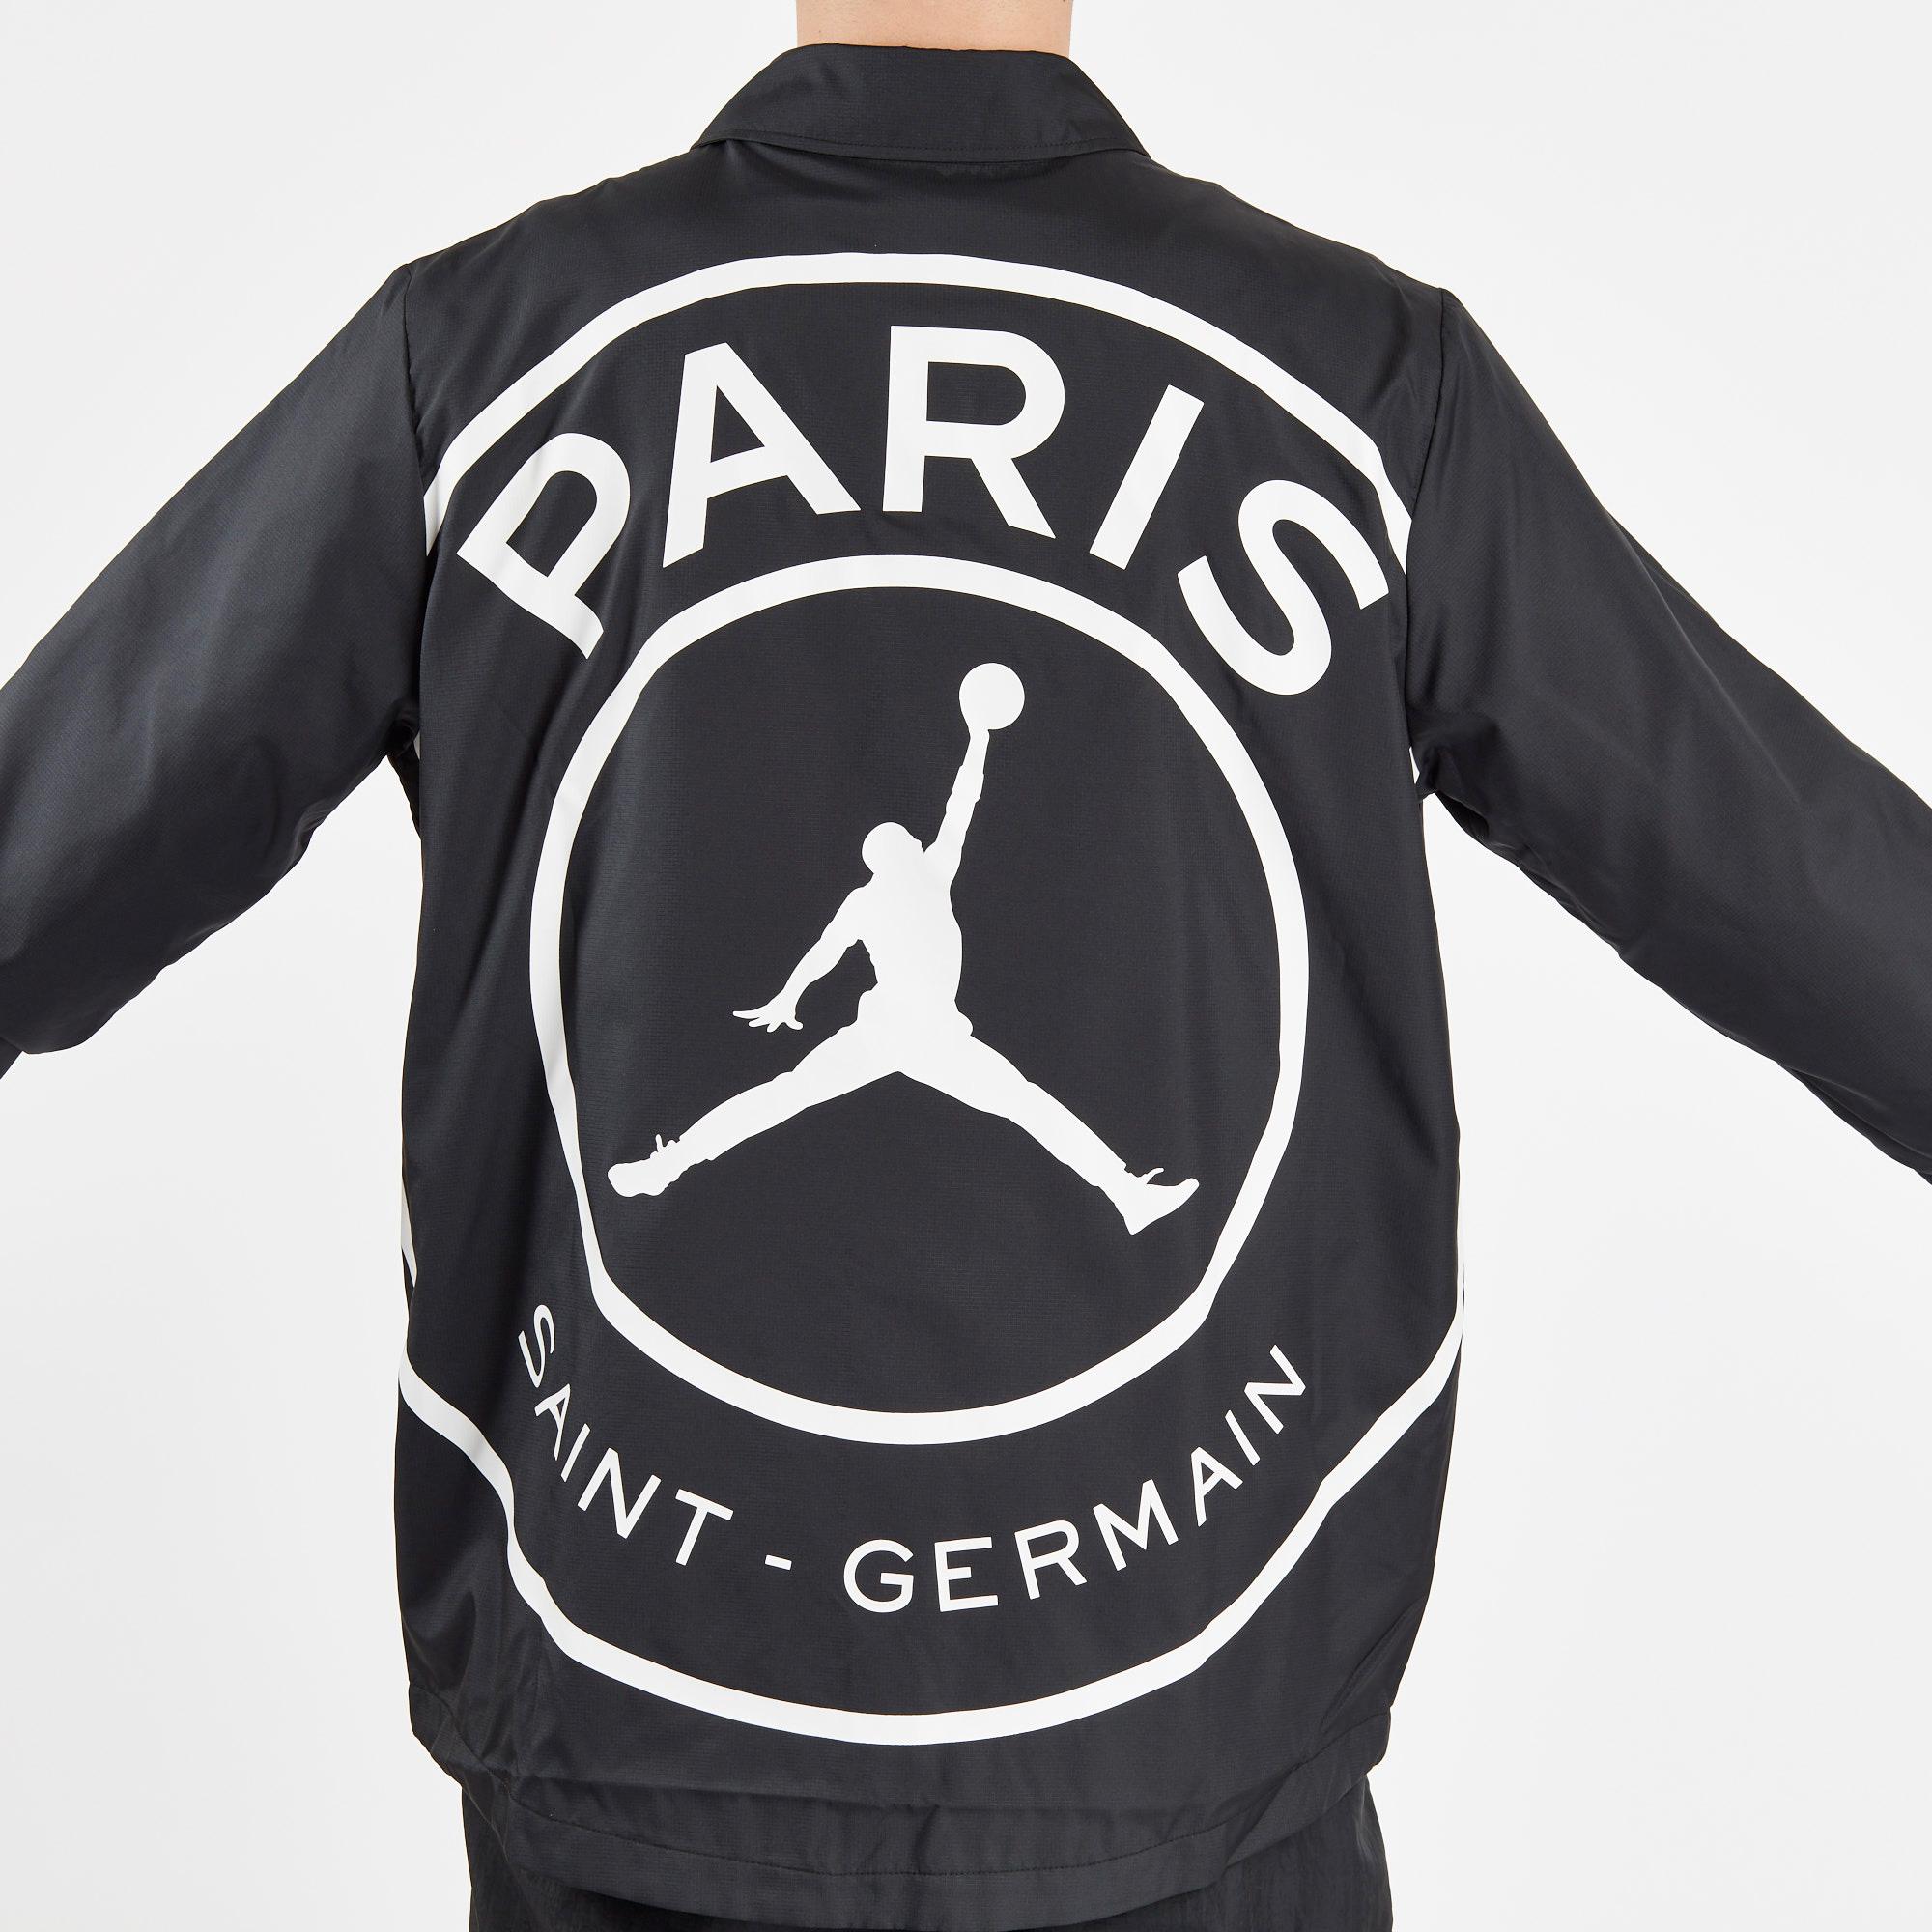 jordan brand bcfc coaches jacket bq4213 010 sneakersnstuff i sneakers streetwear online seit 1999